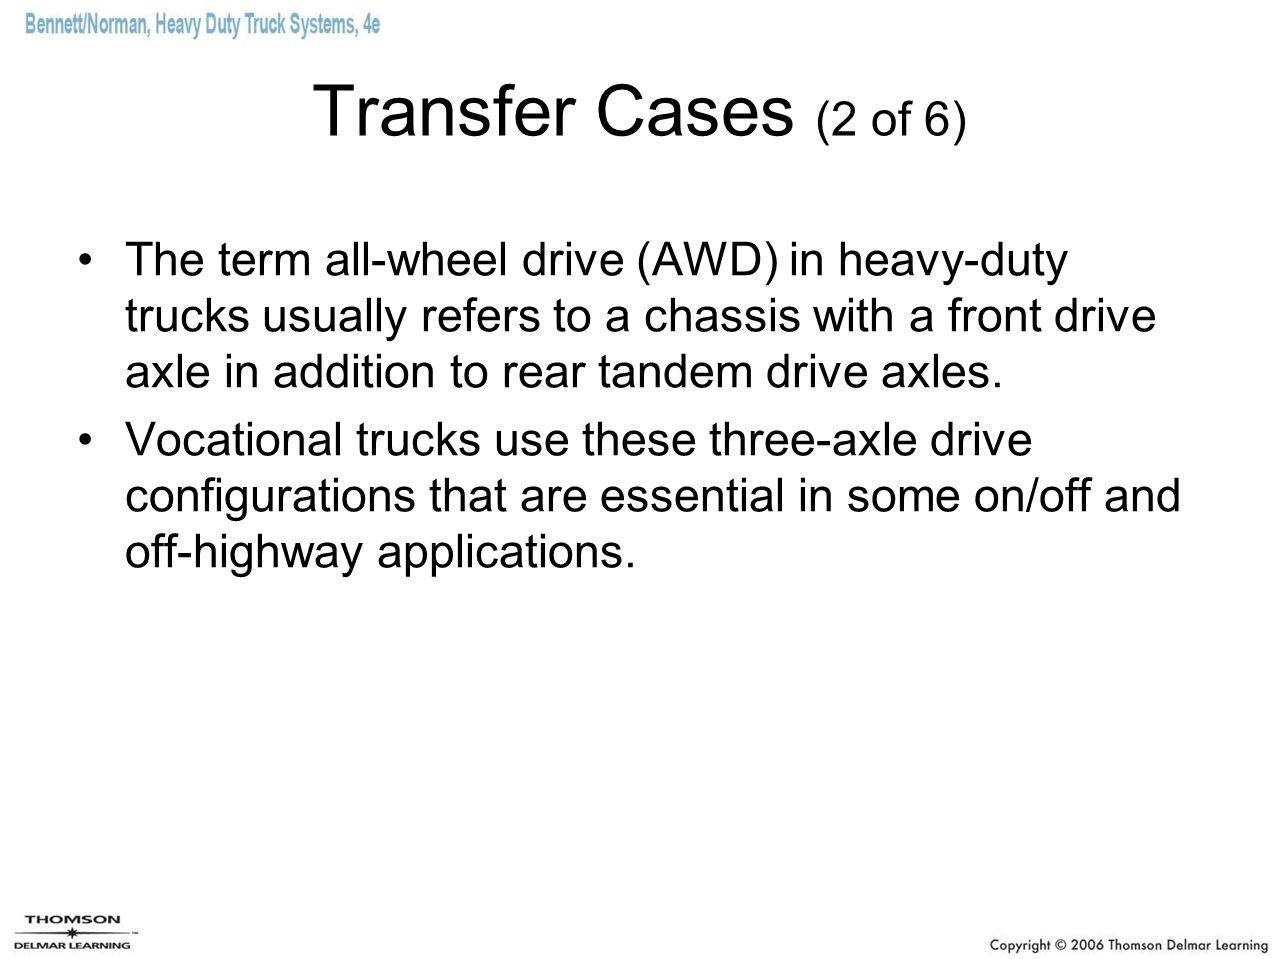 Transfer Cases (2 of 6)